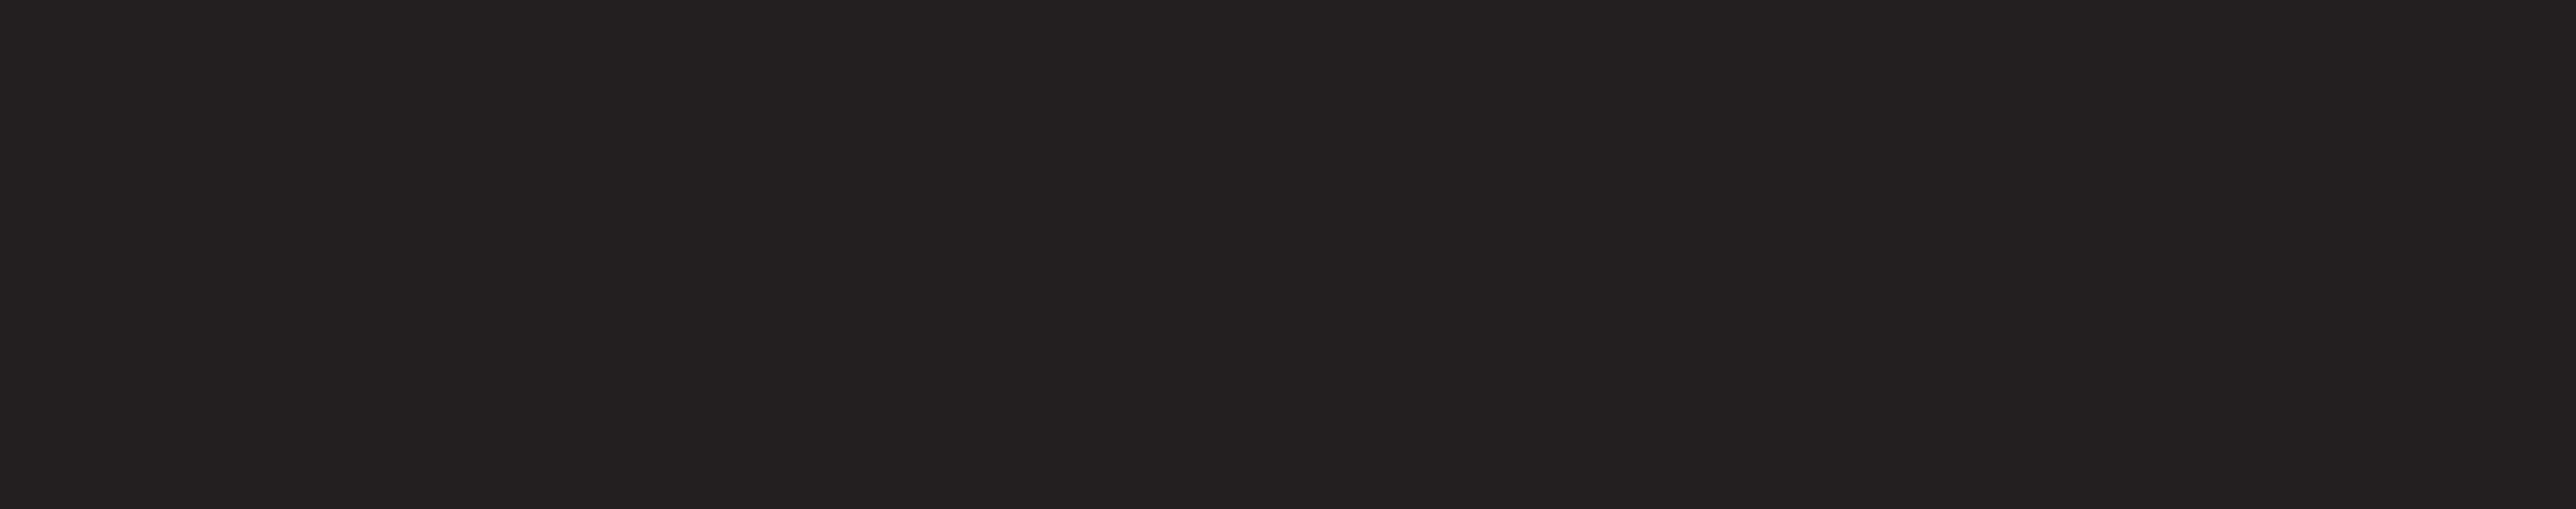 fc8.westelm logo 01